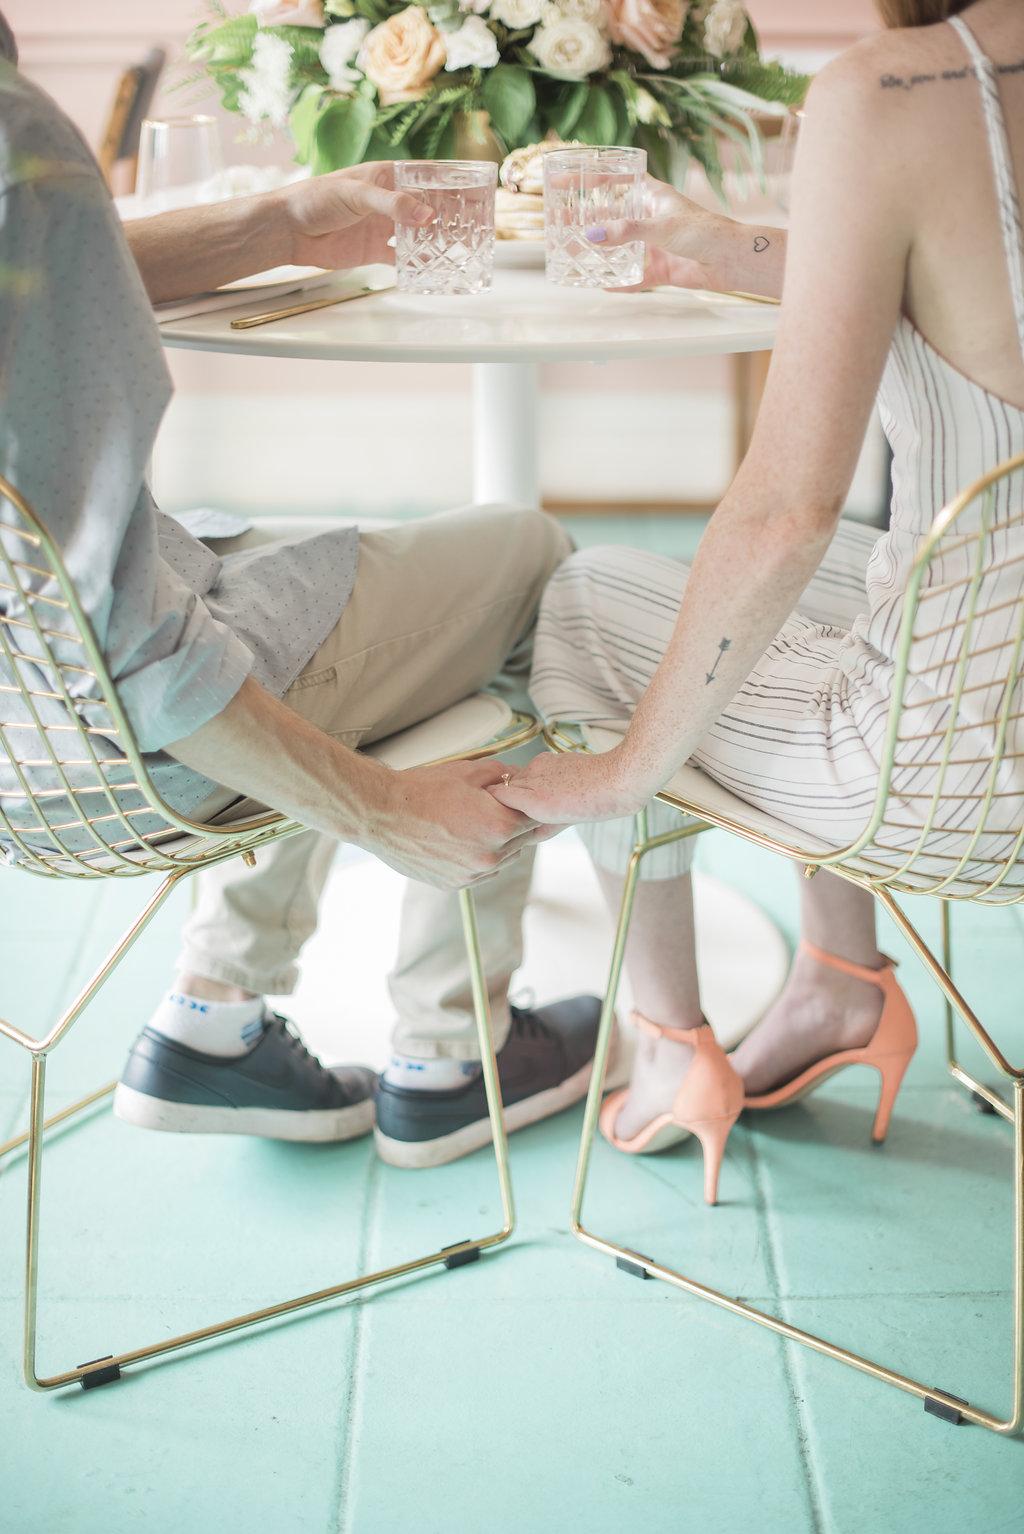 Motel-Restaurant-Editorial-Vineyard-Bride-photo-by-Blynda-DaCosta-Photography-023.JPG